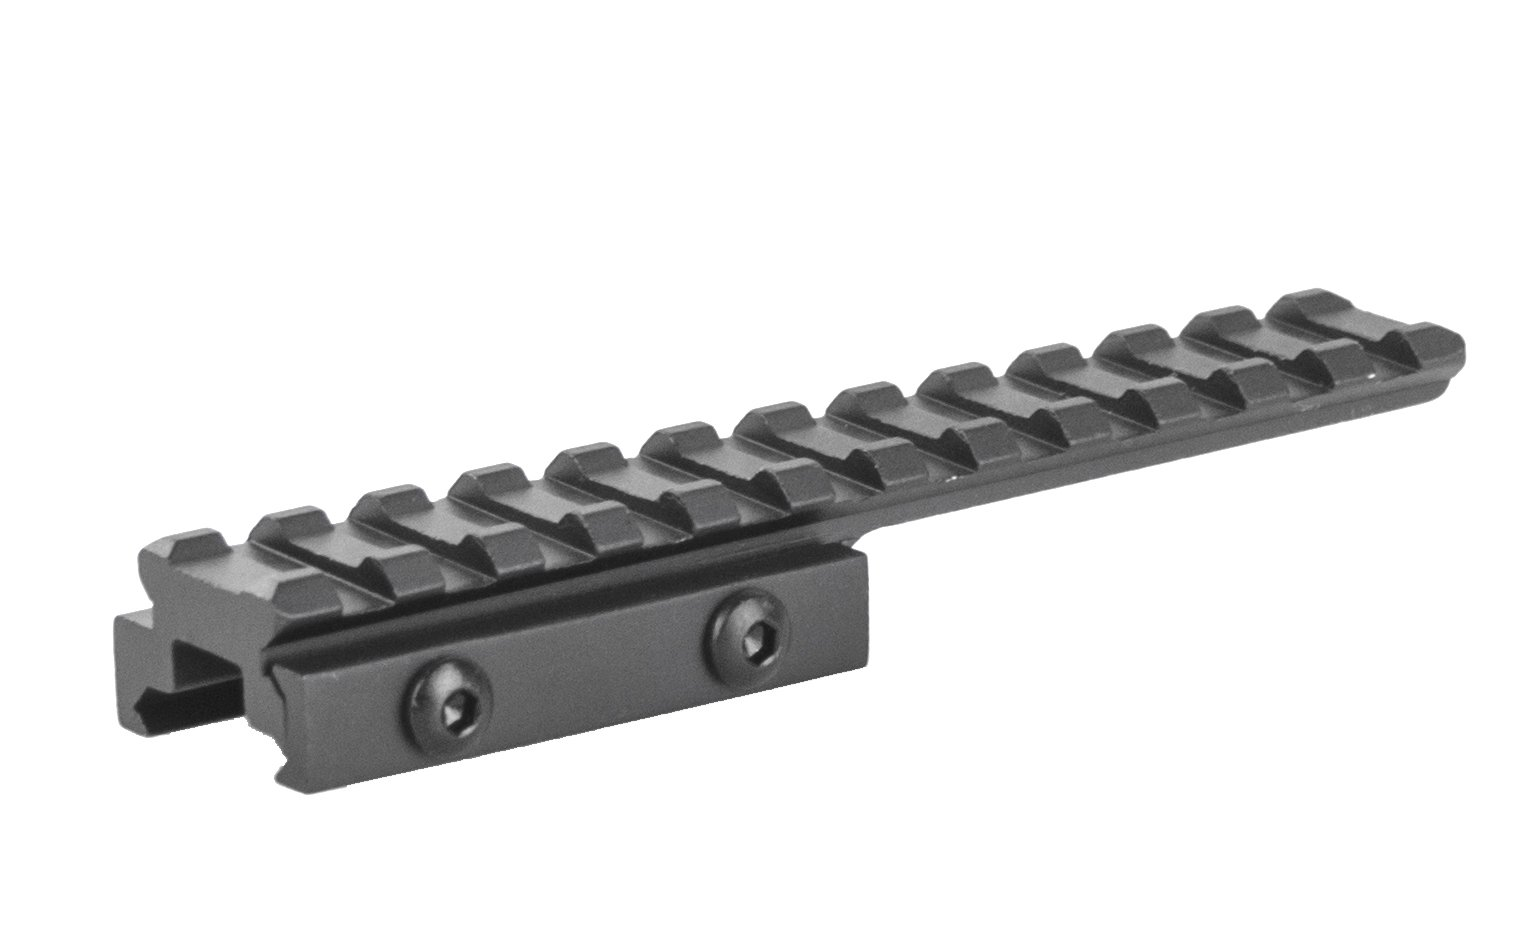 12 Slots 0.5'' Low Profile Picatinny Rail Bridge Mount BM1205EX